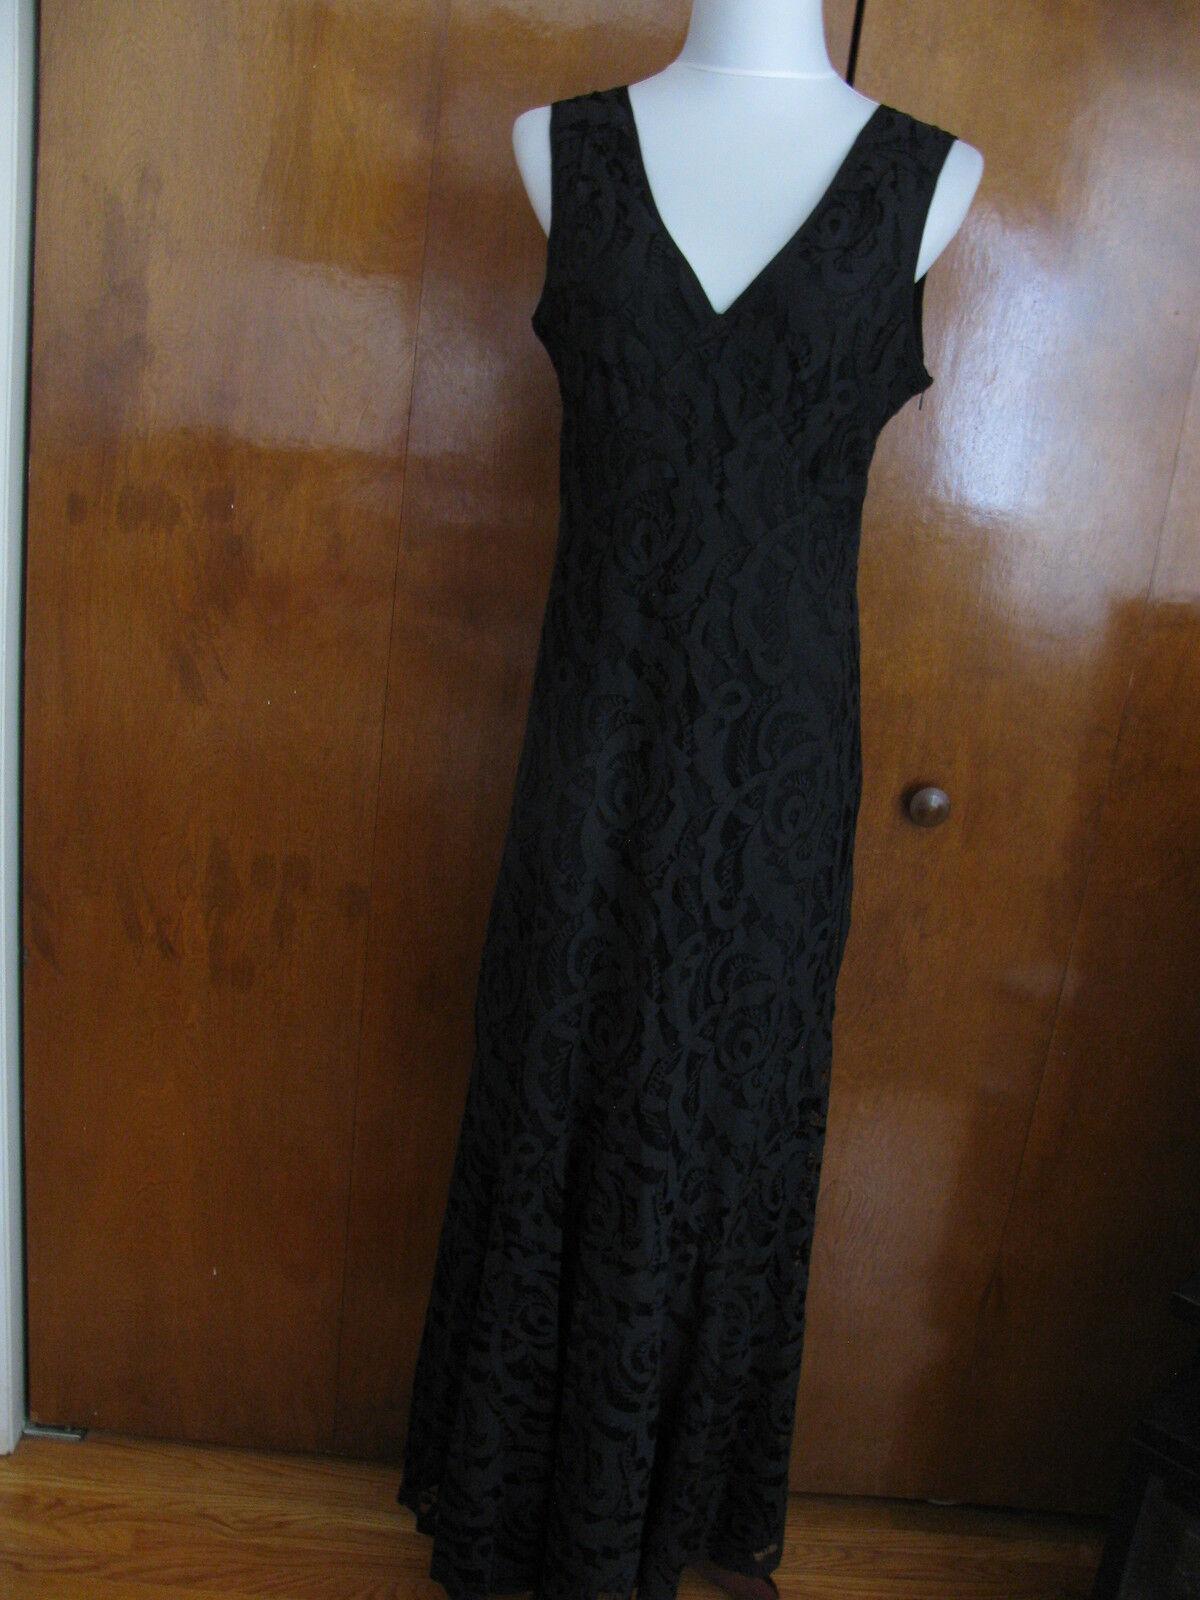 Impulse damen schwarz fabric crafted lined evening dress Größe Large NWT